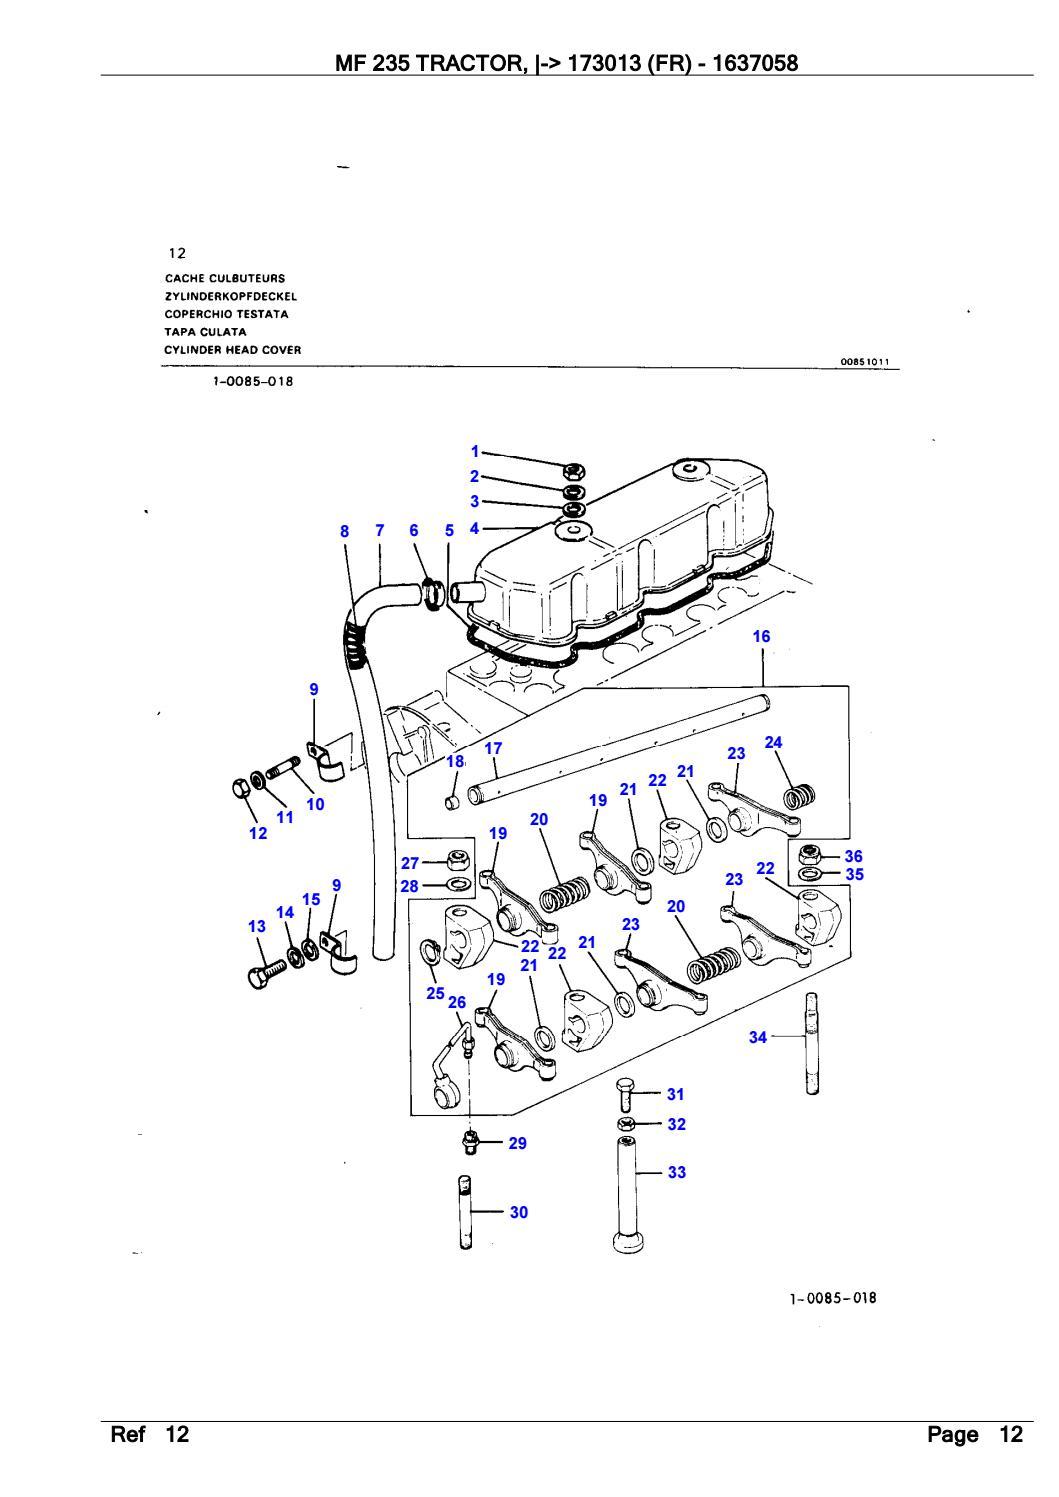 Massey Ferguson MF 235 TRACTOR (FR) Parts Catalogue Manual